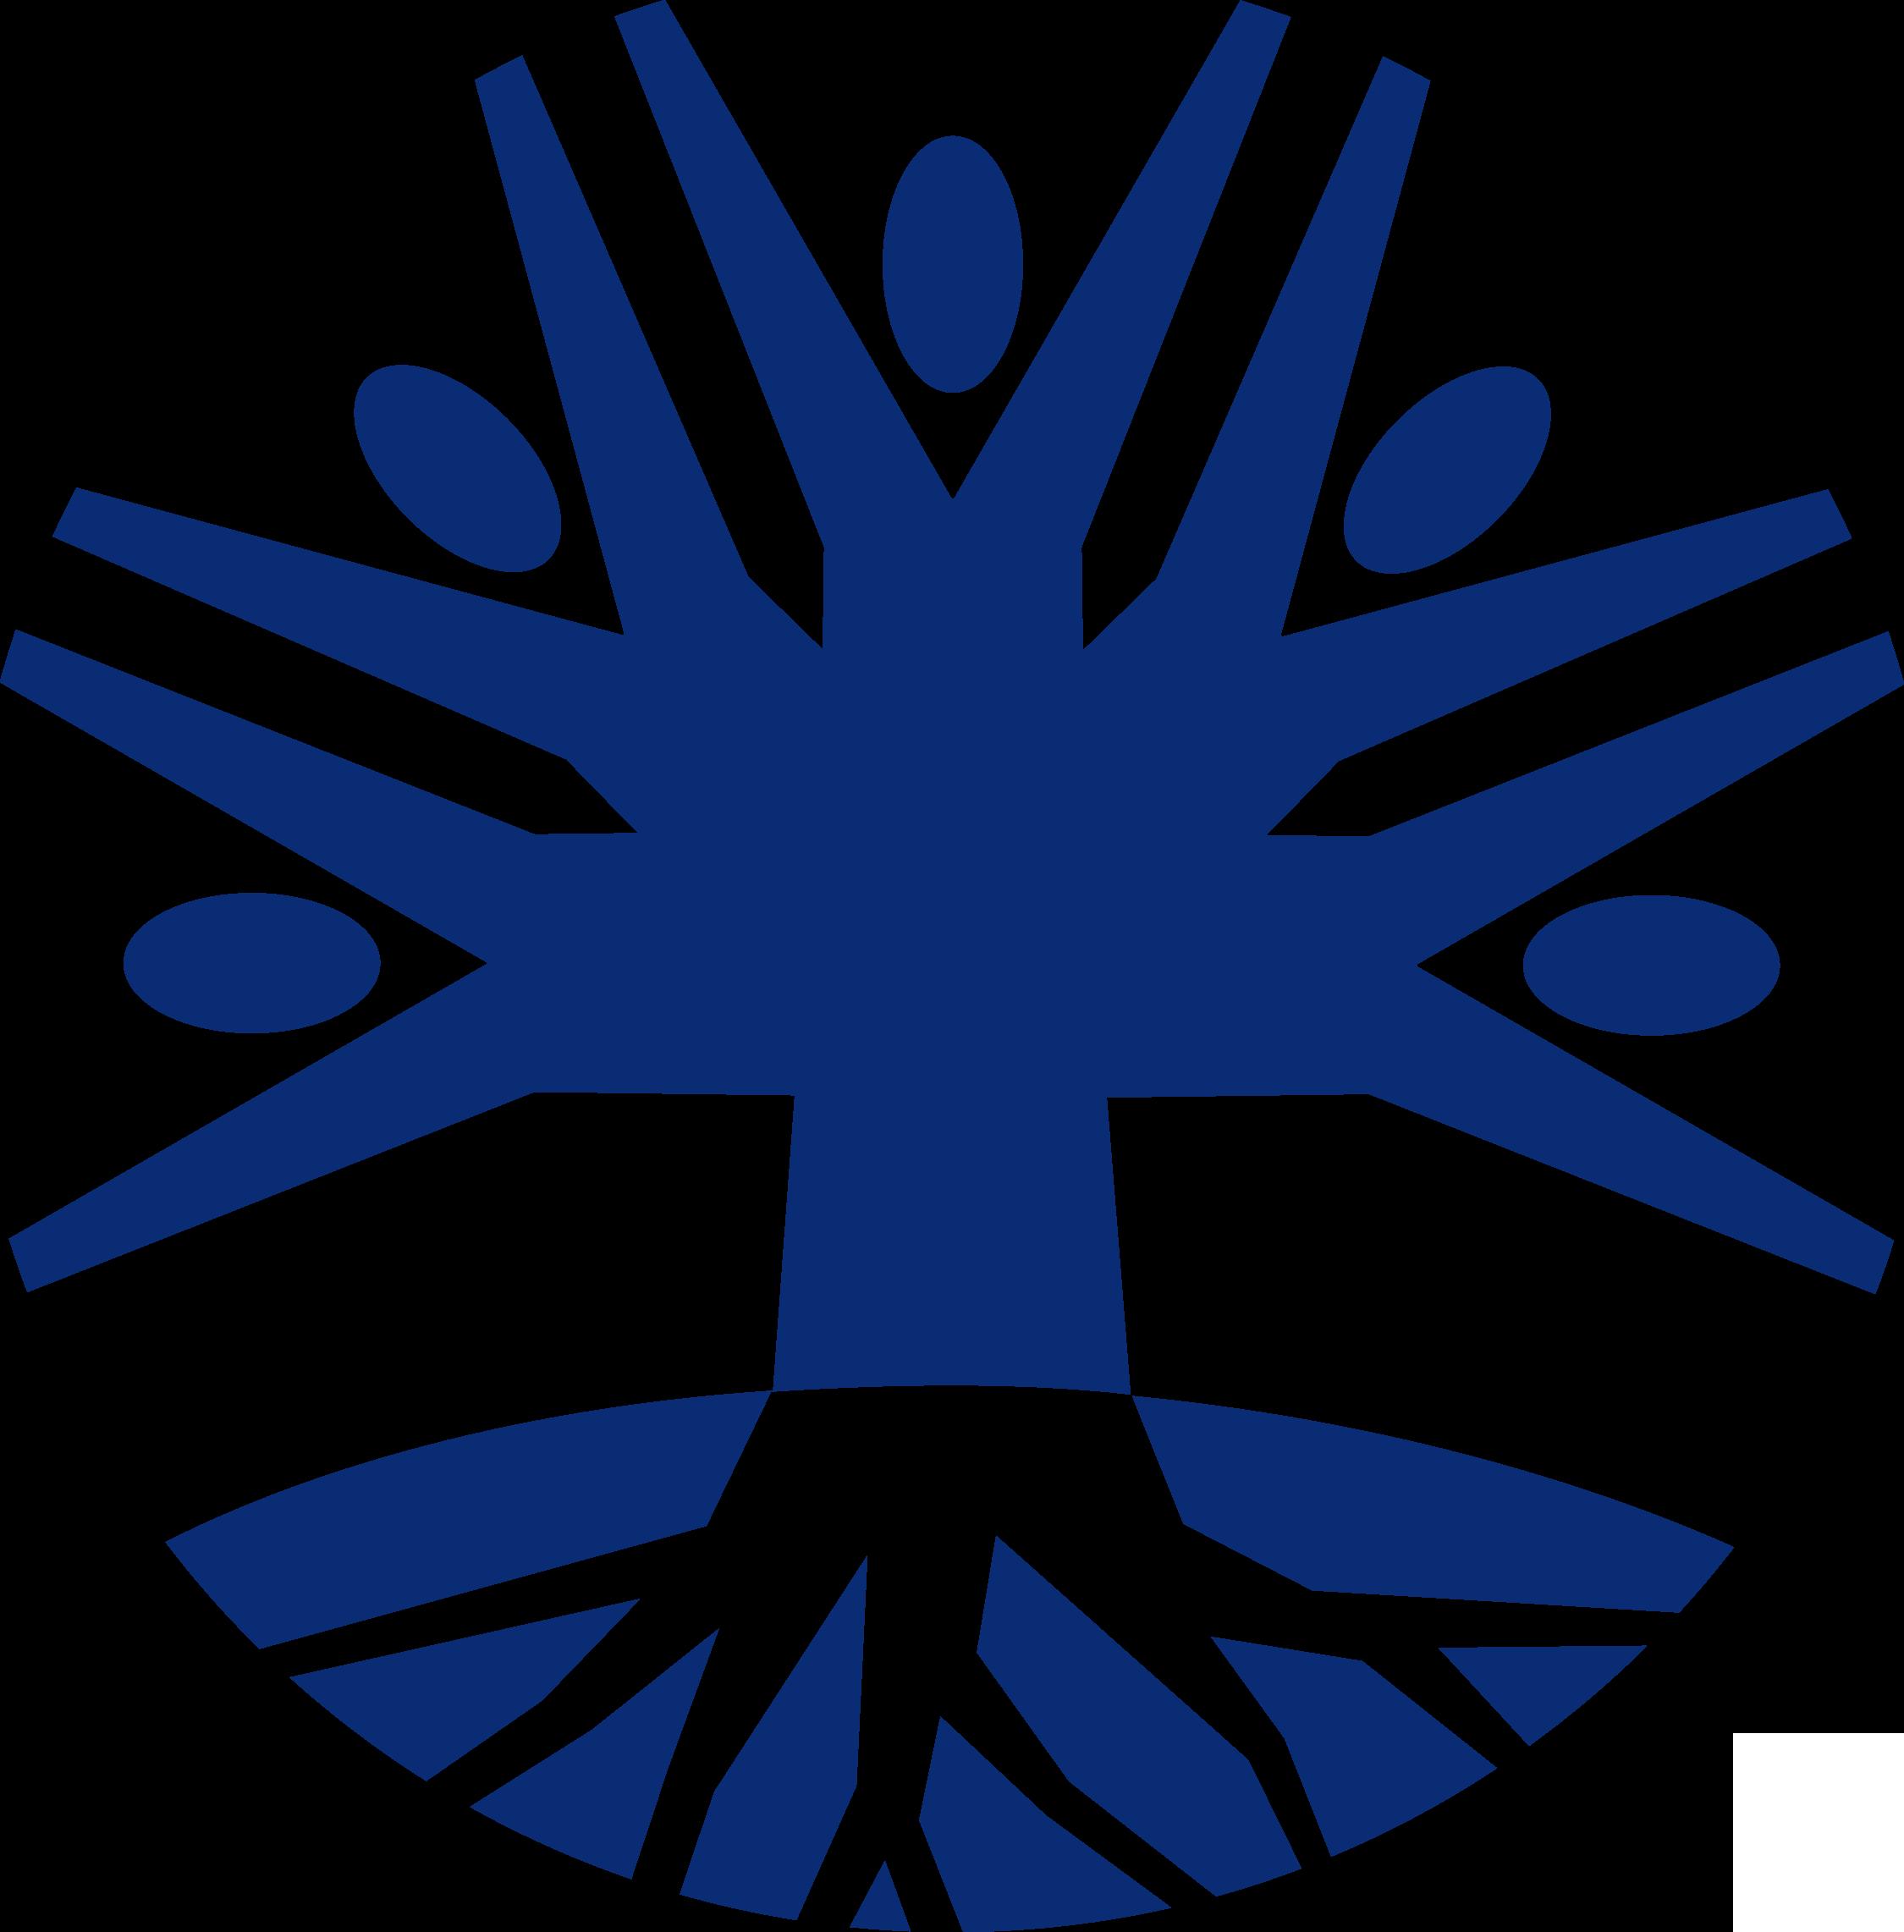 blue stakeholder tree